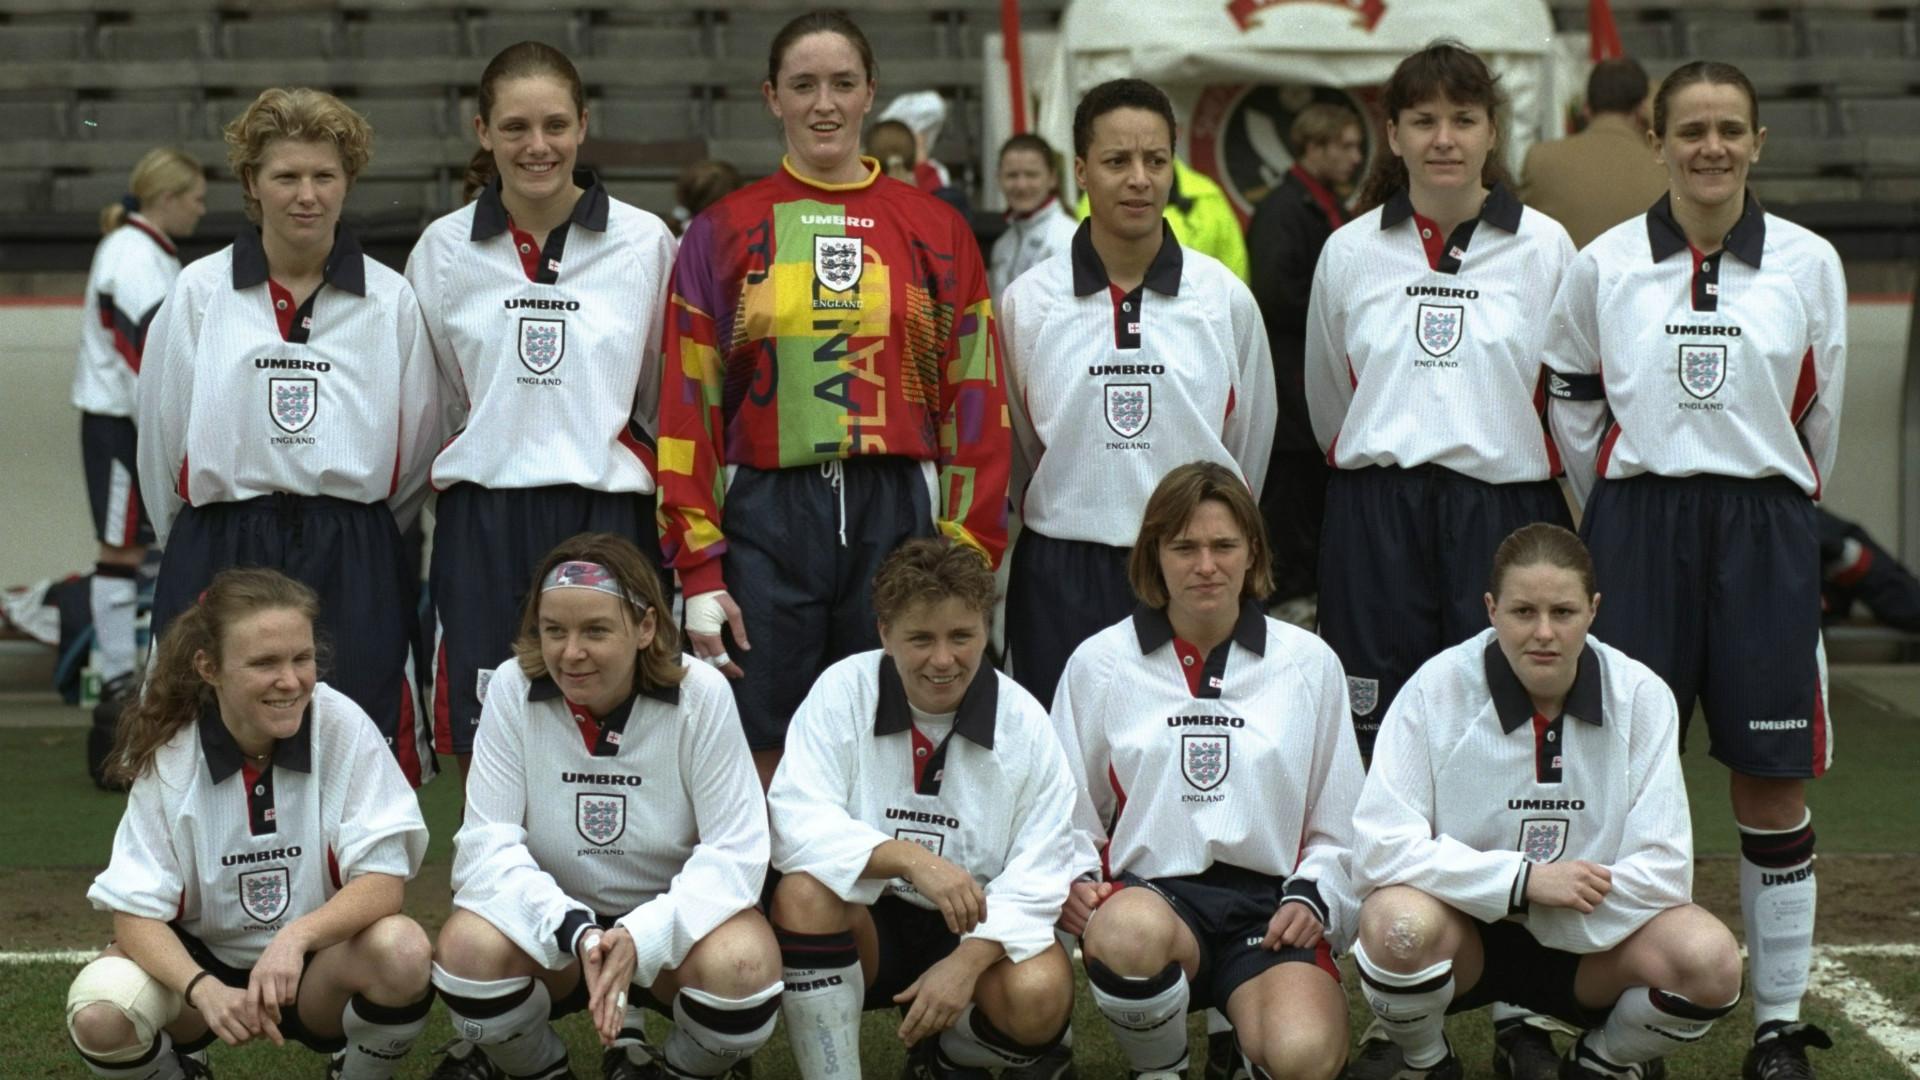 England 1997